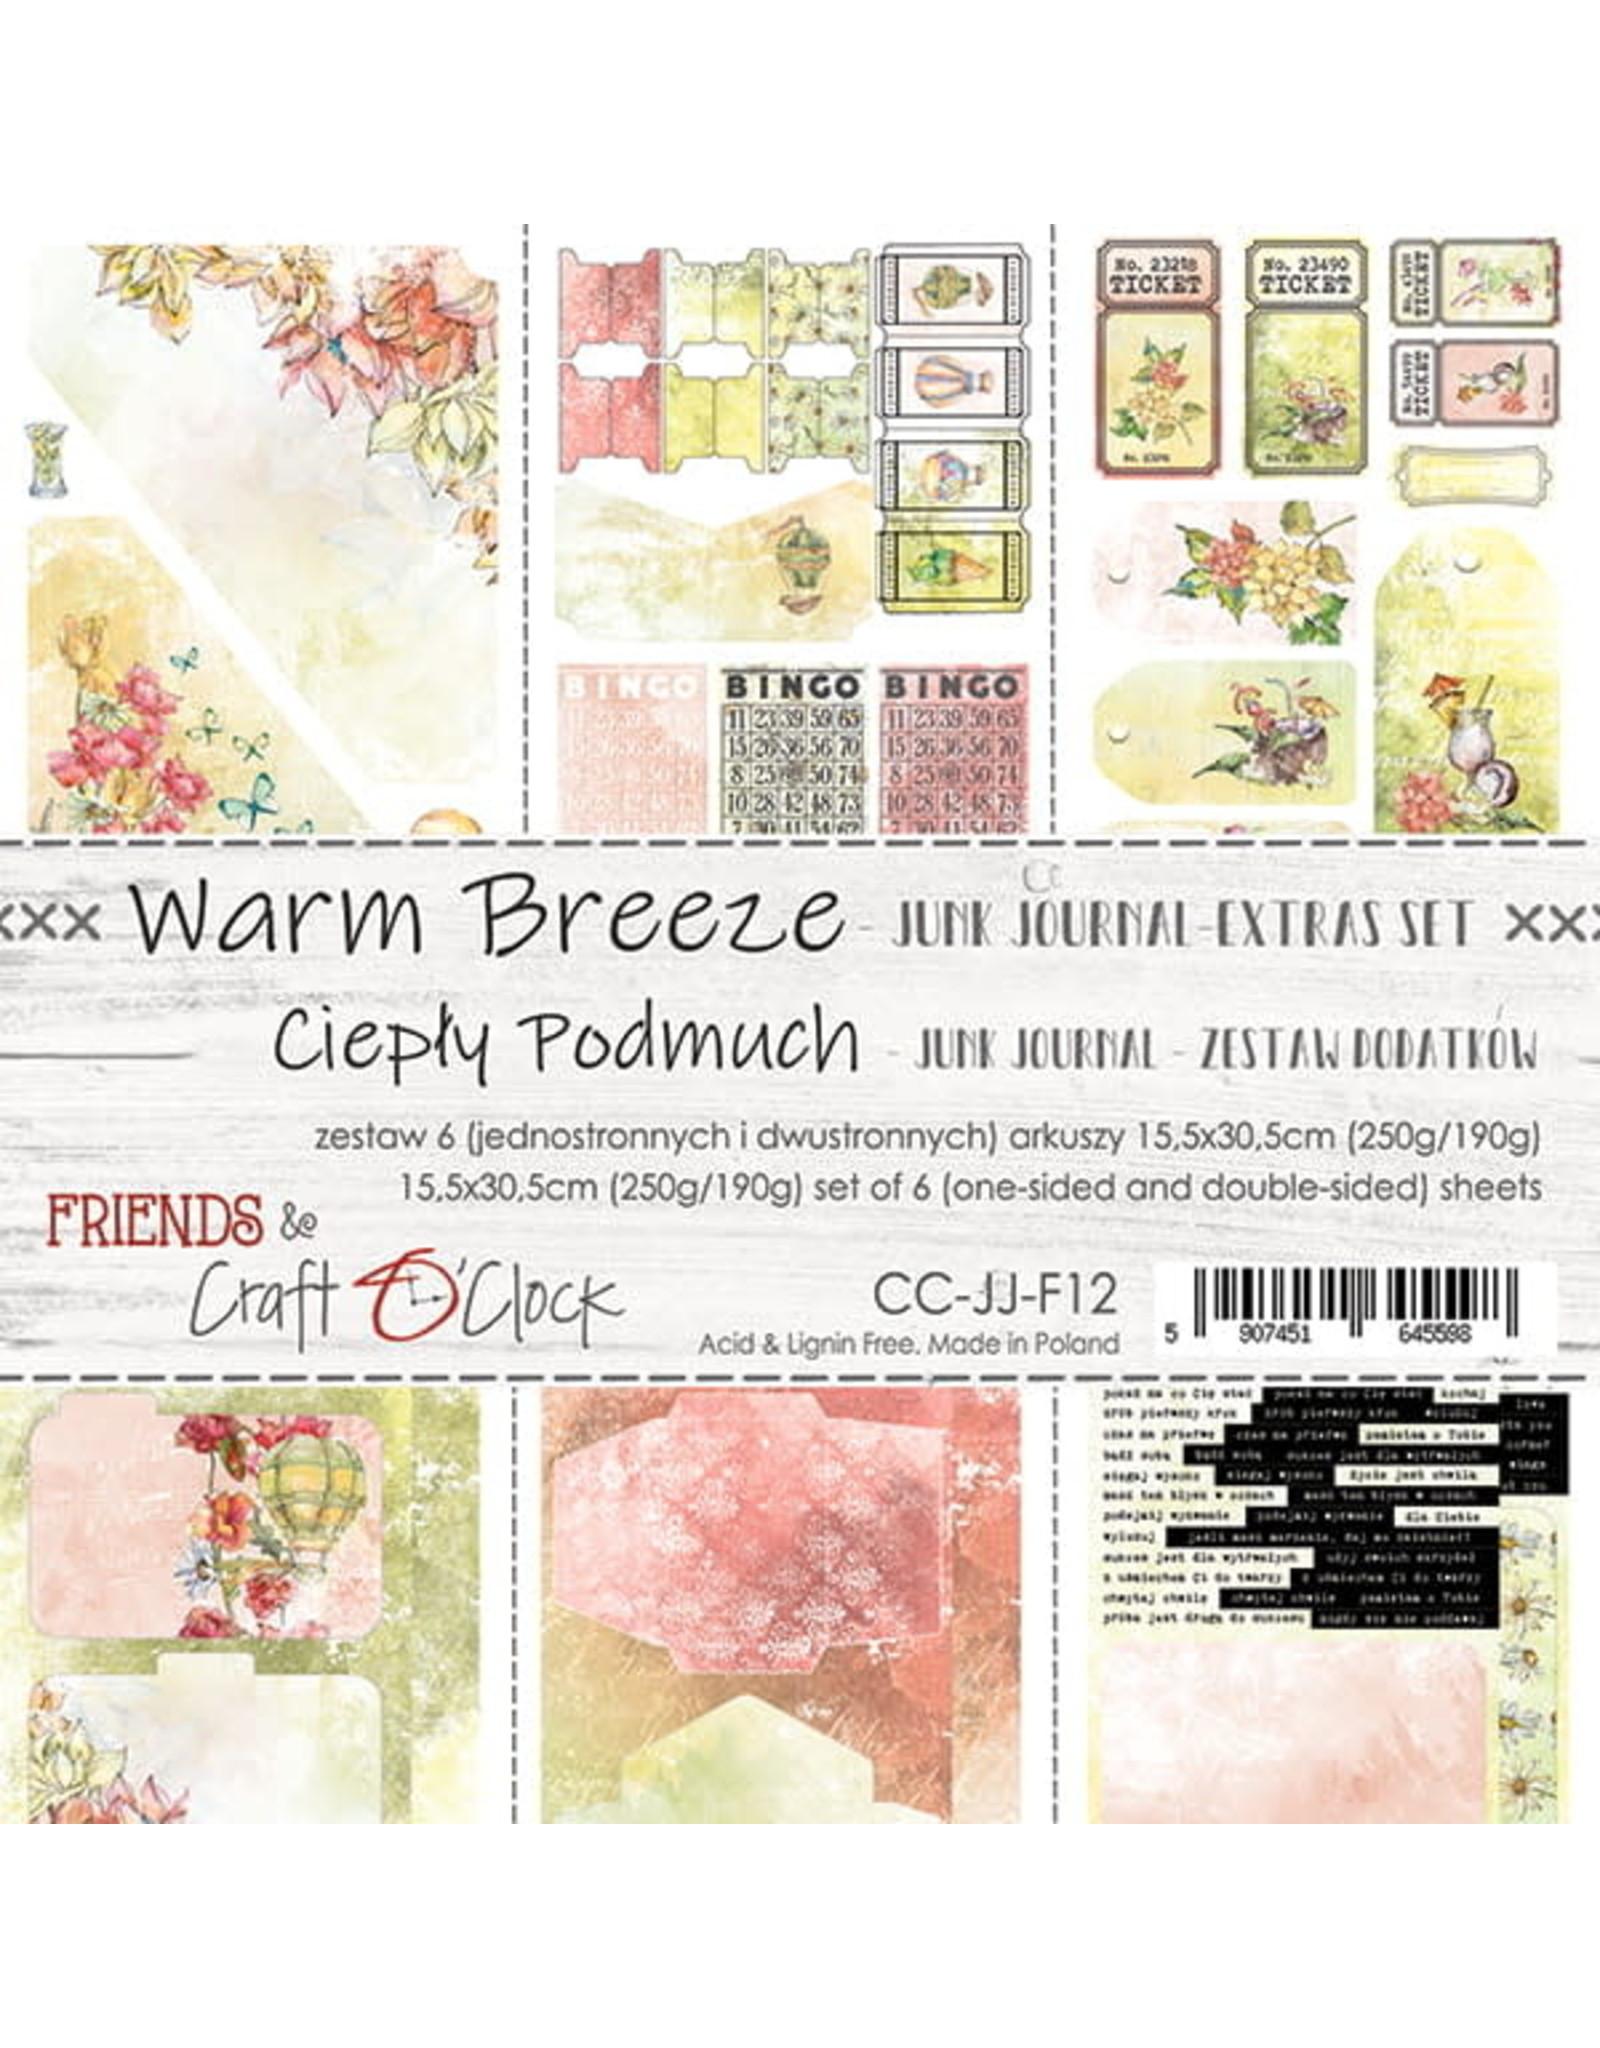 Craft O'Clock CraftO'Clock Warm Breeze Junk journal set